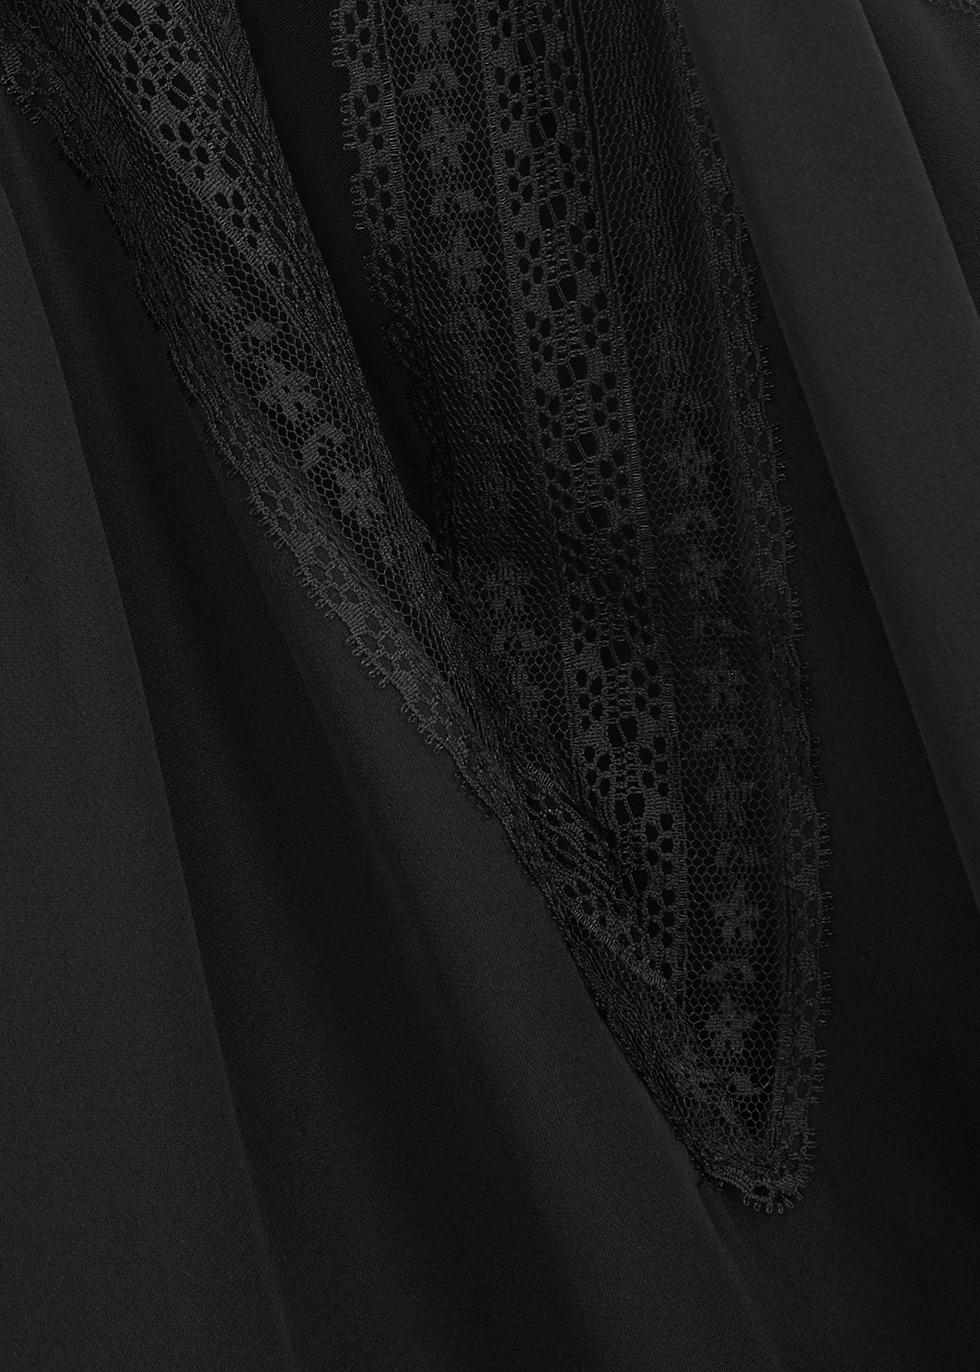 Chantry black silk cami - Cami NYC